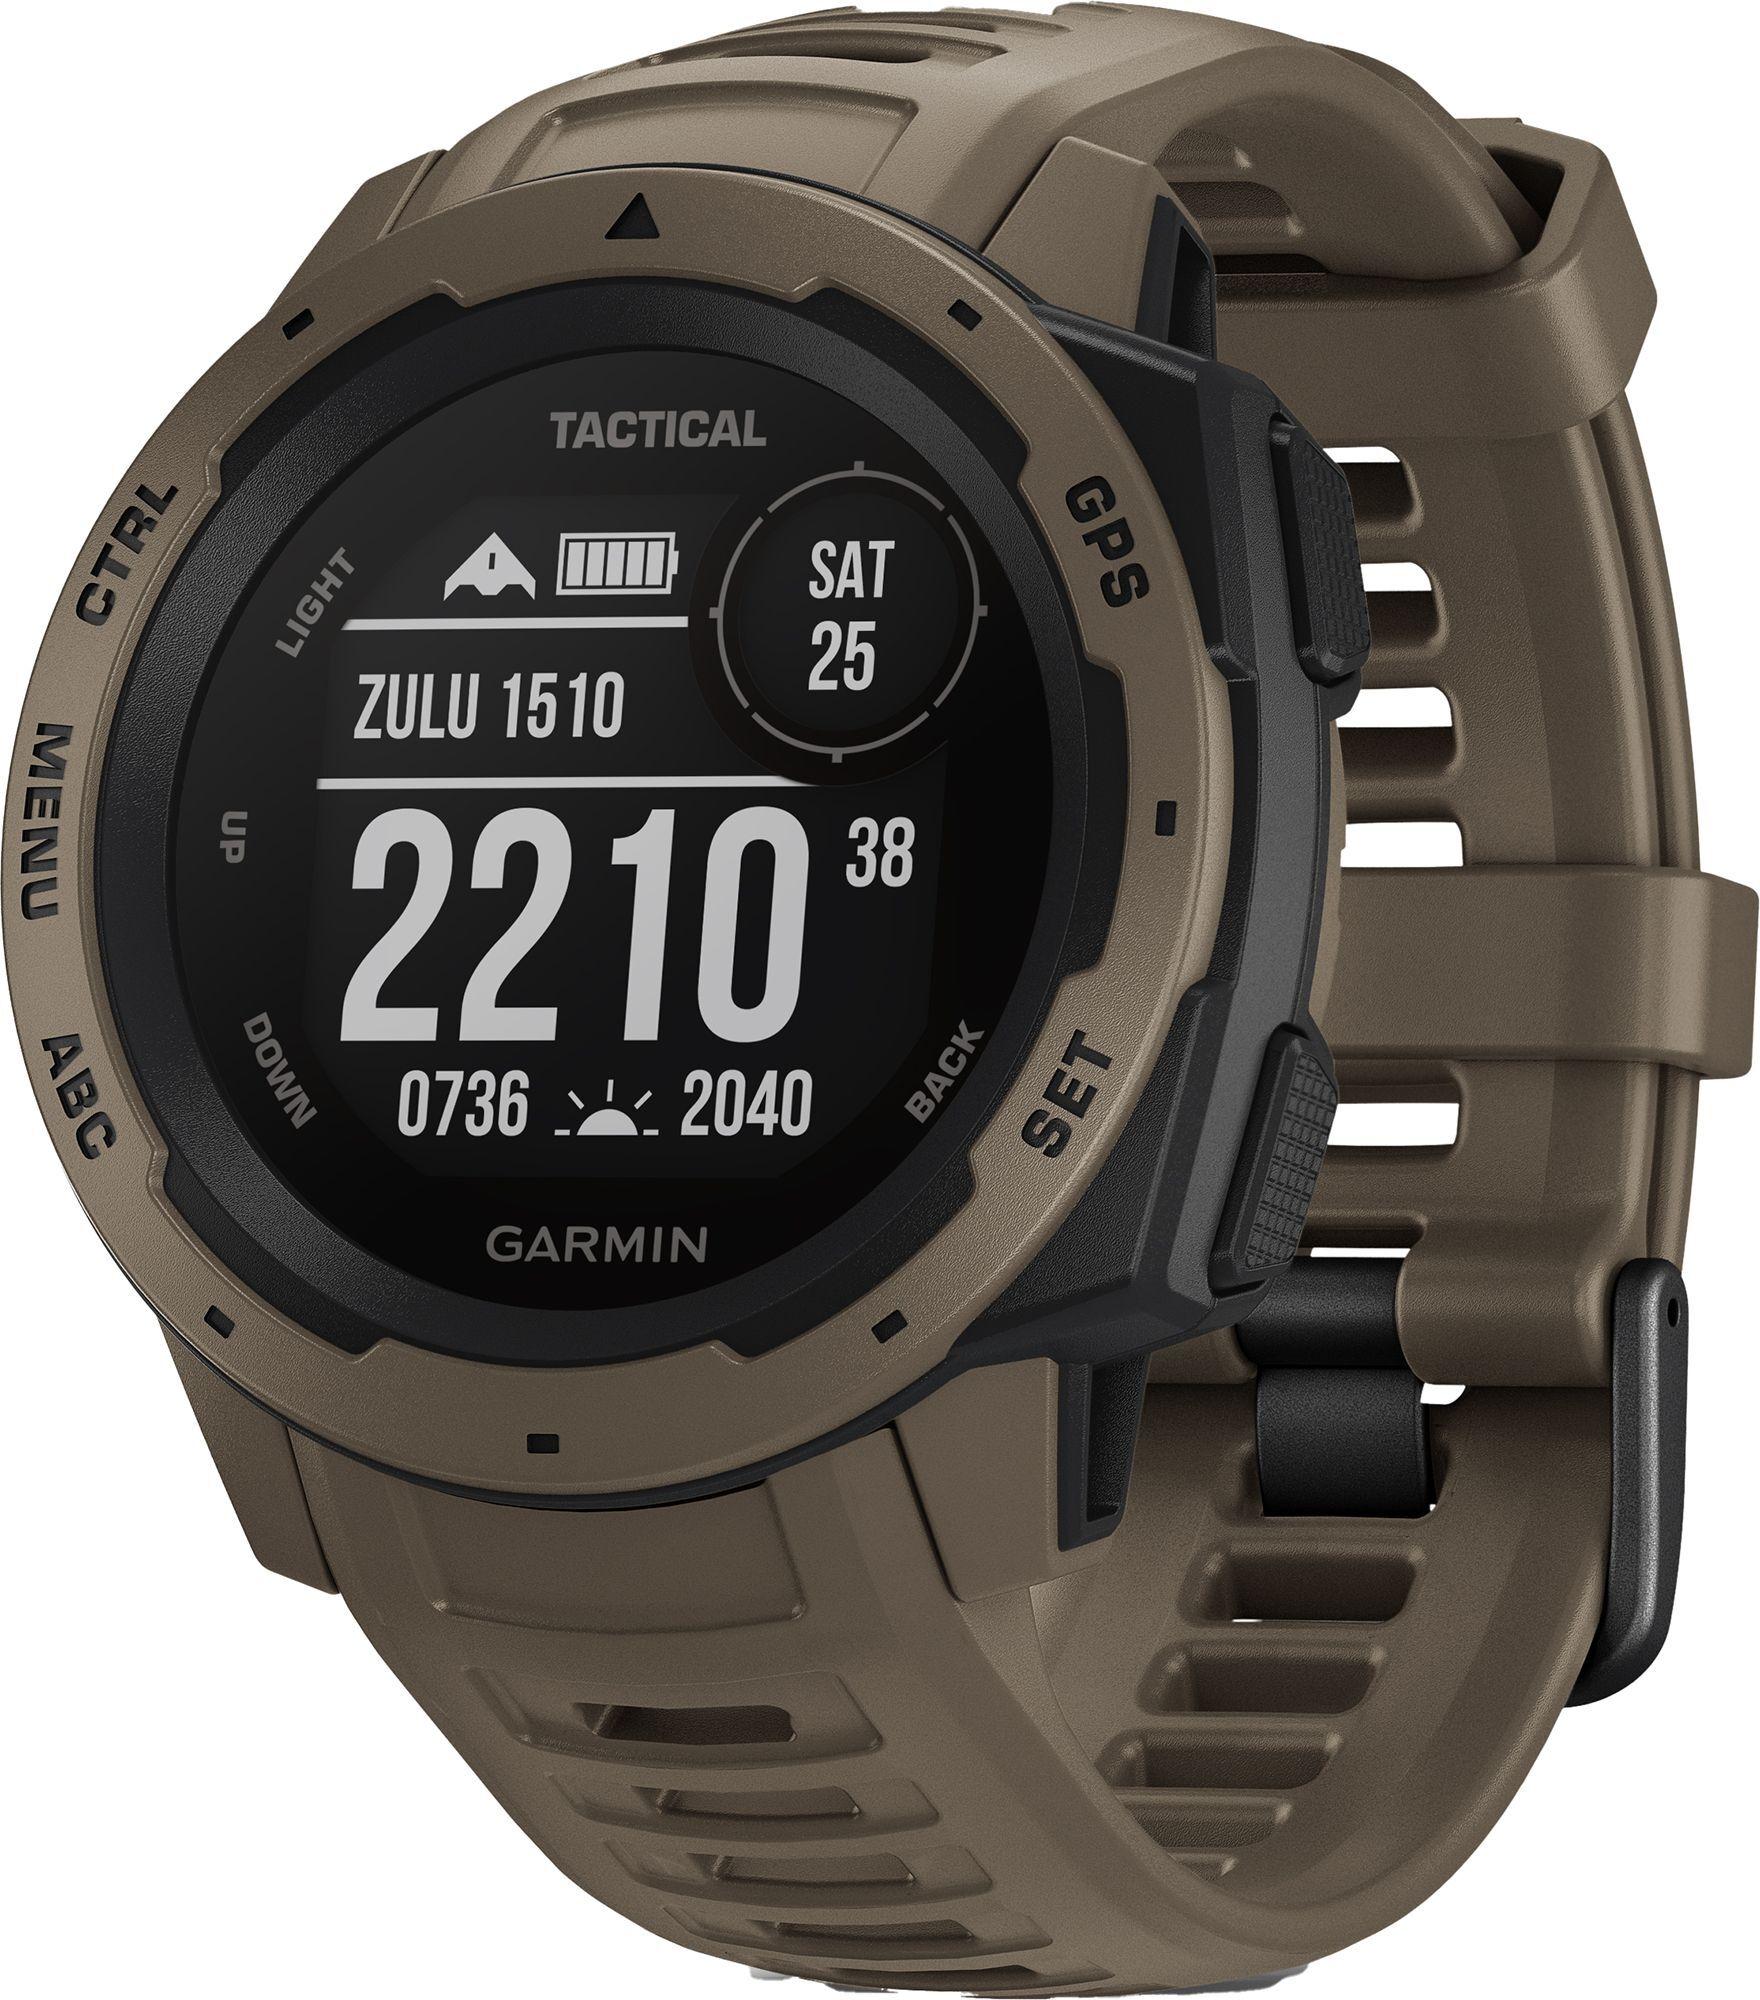 Instinct Tactical Smartwatch, Tan